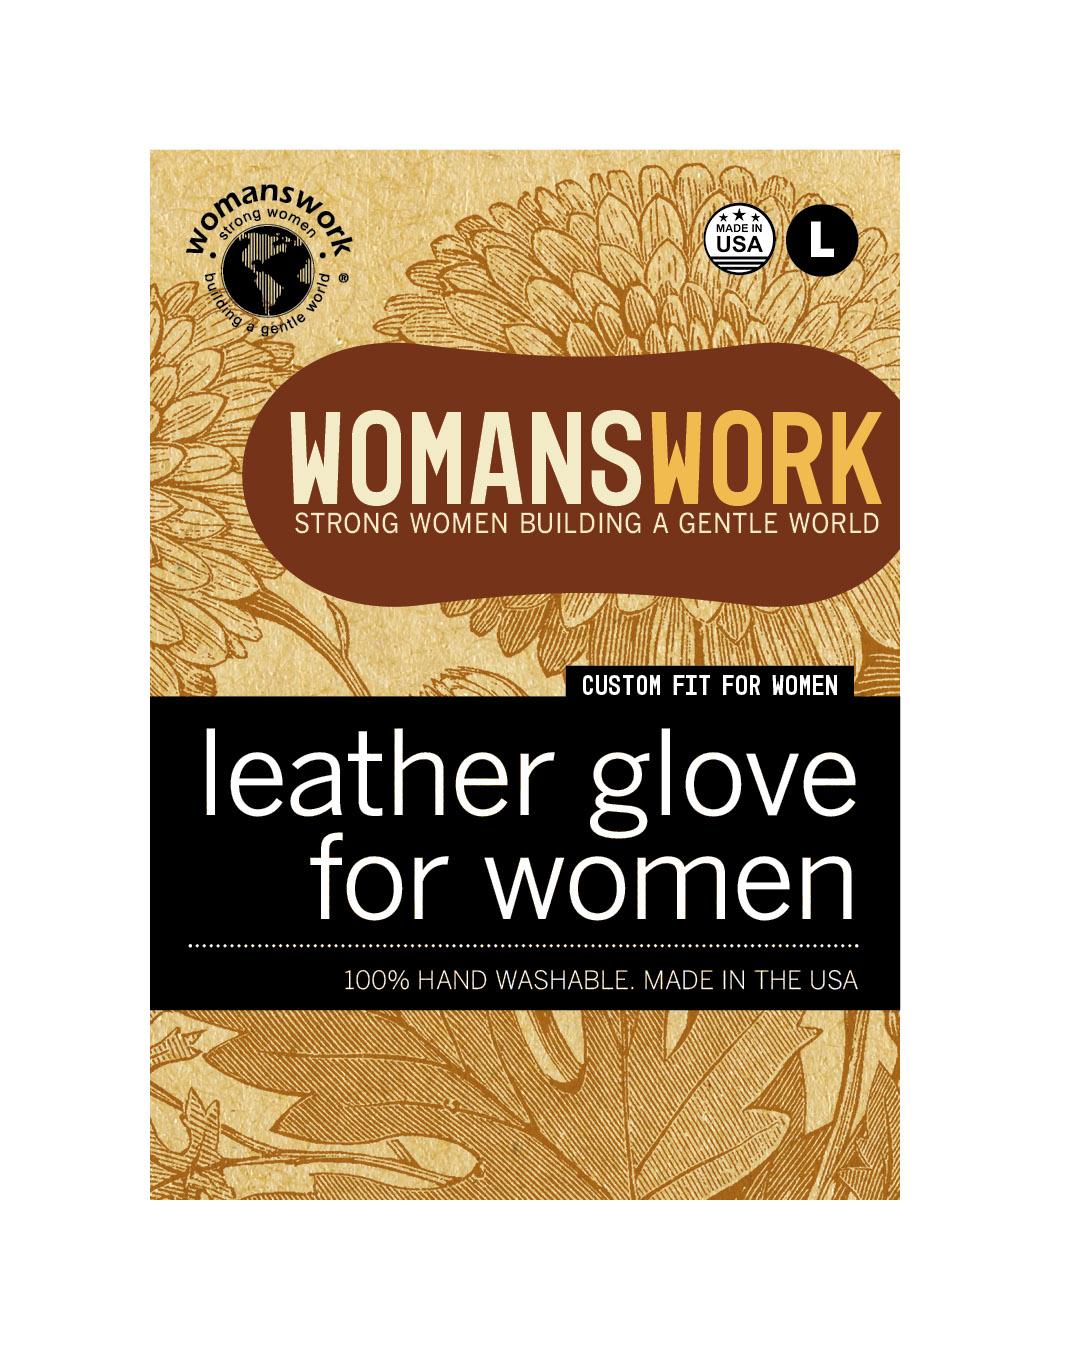 Design for Womanswork glove labels